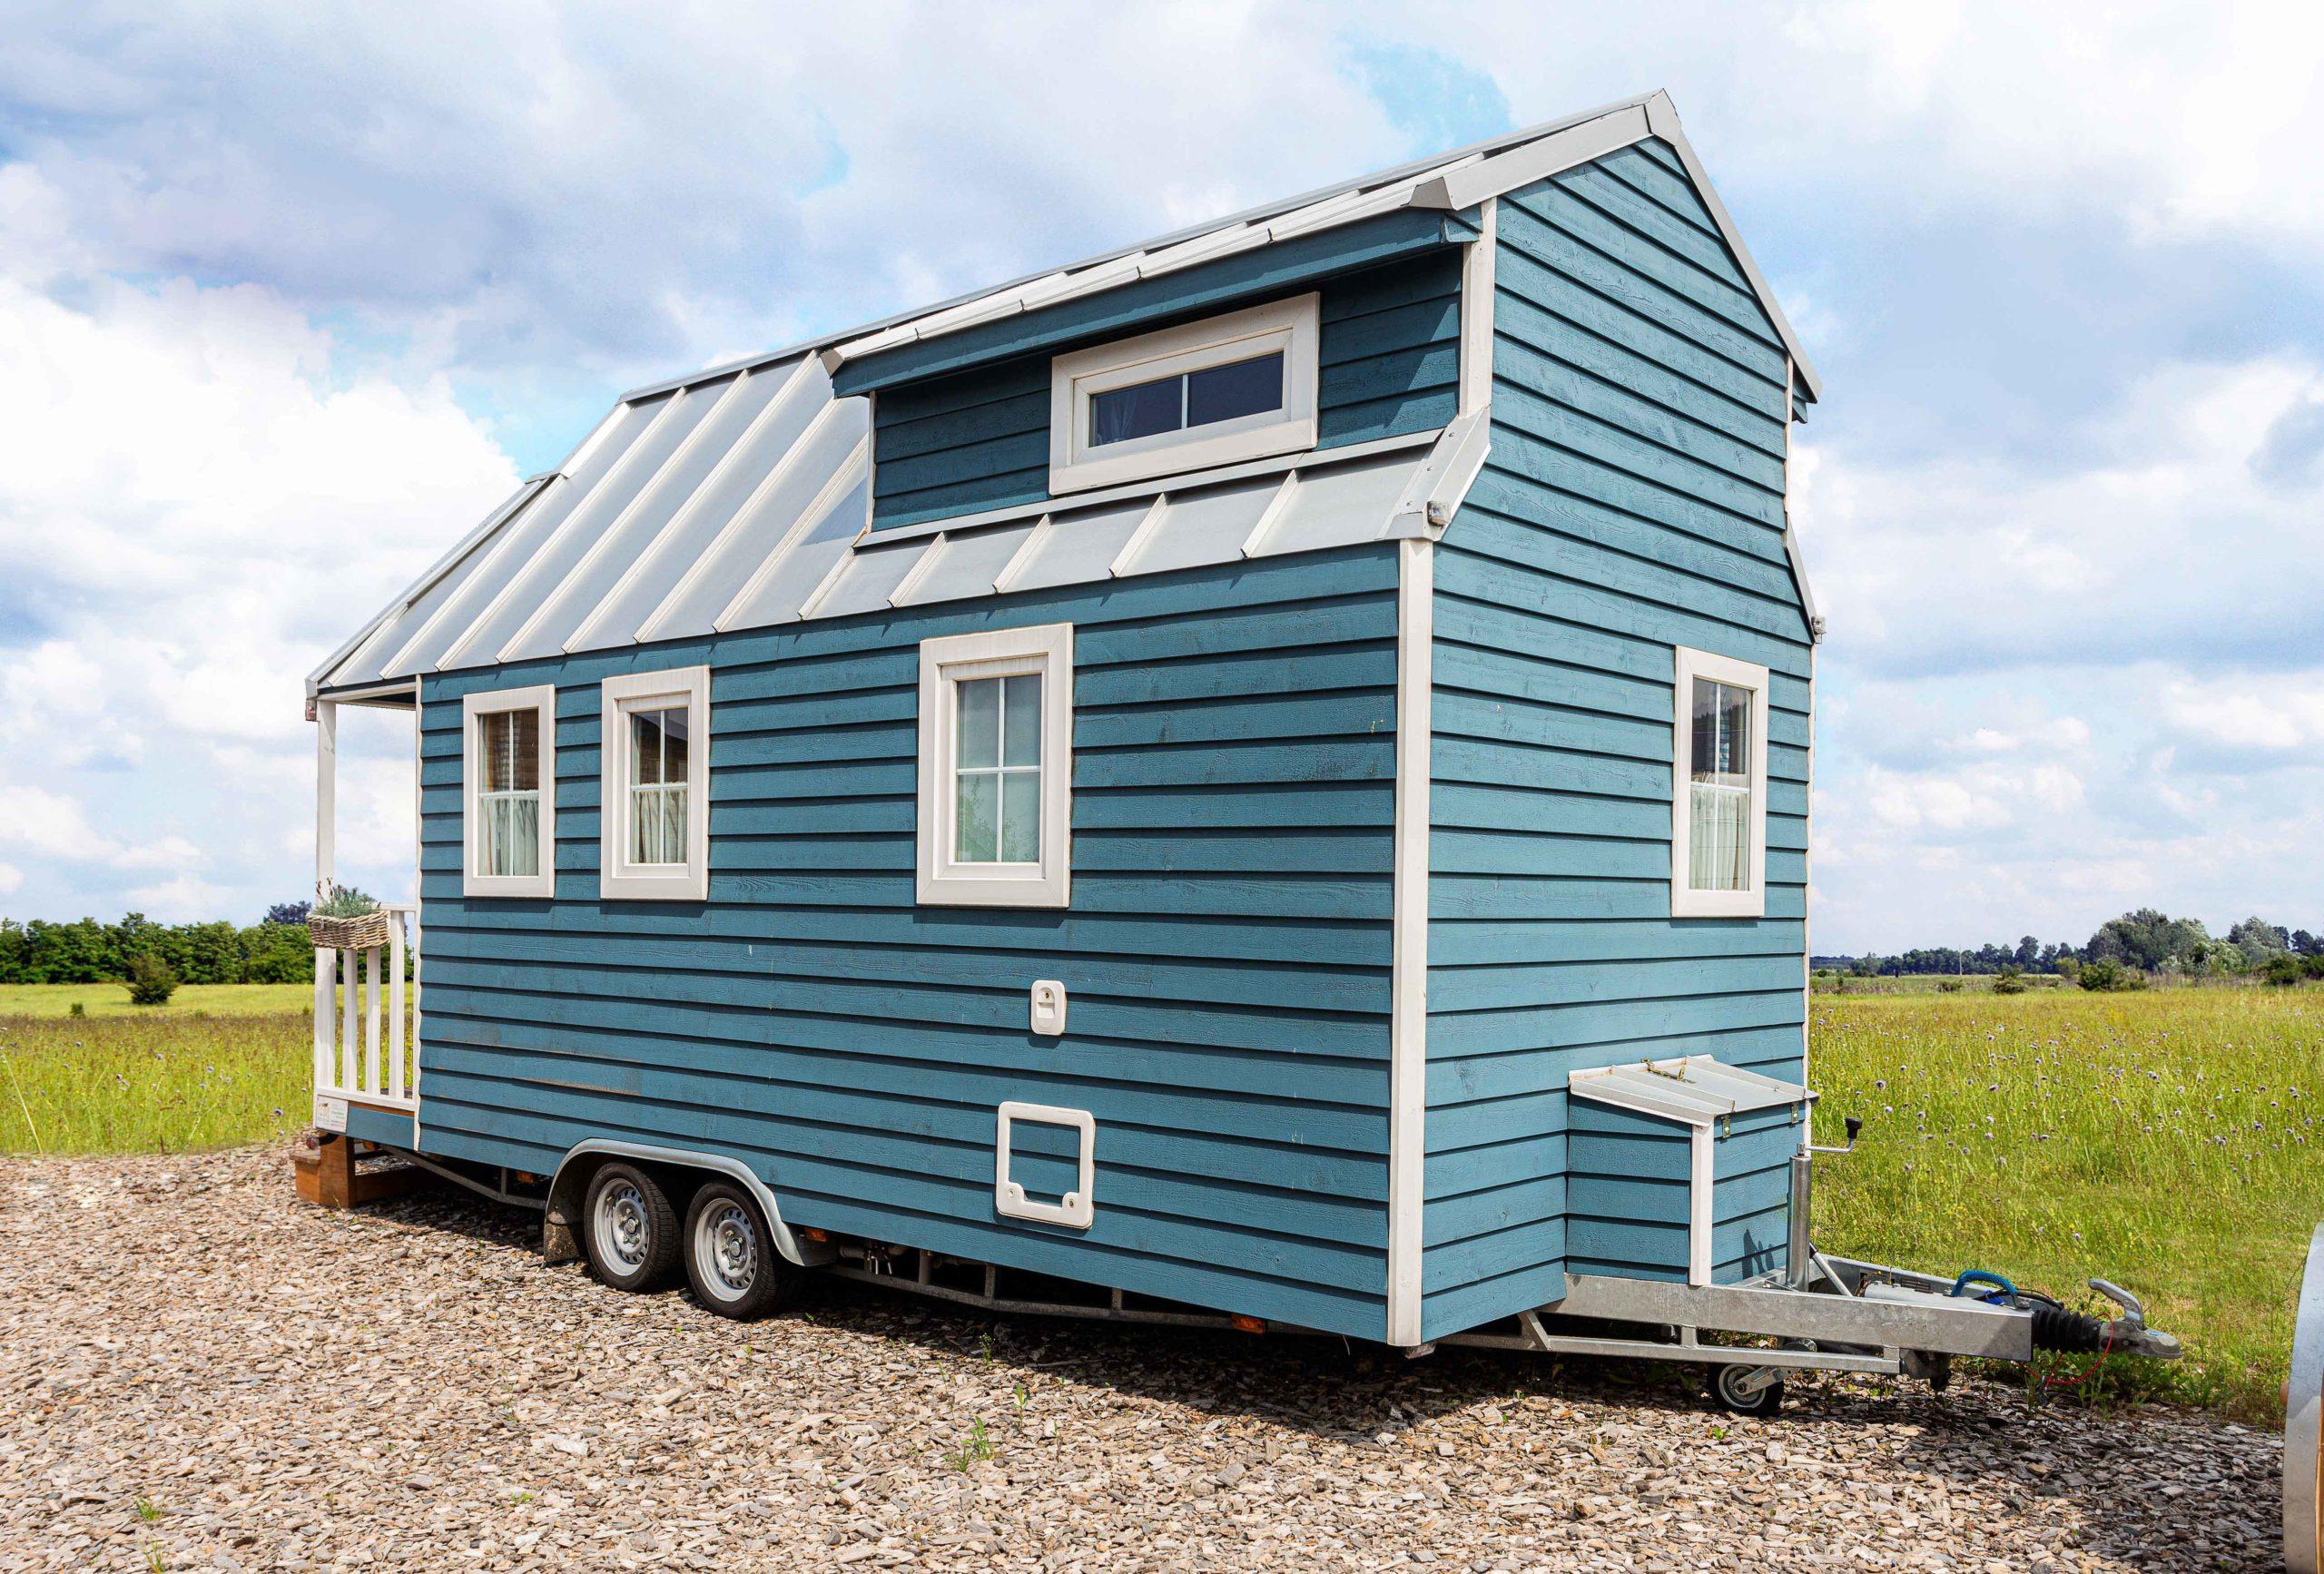 mobiles-tiny-house-island-vital-camp-gmbh-02